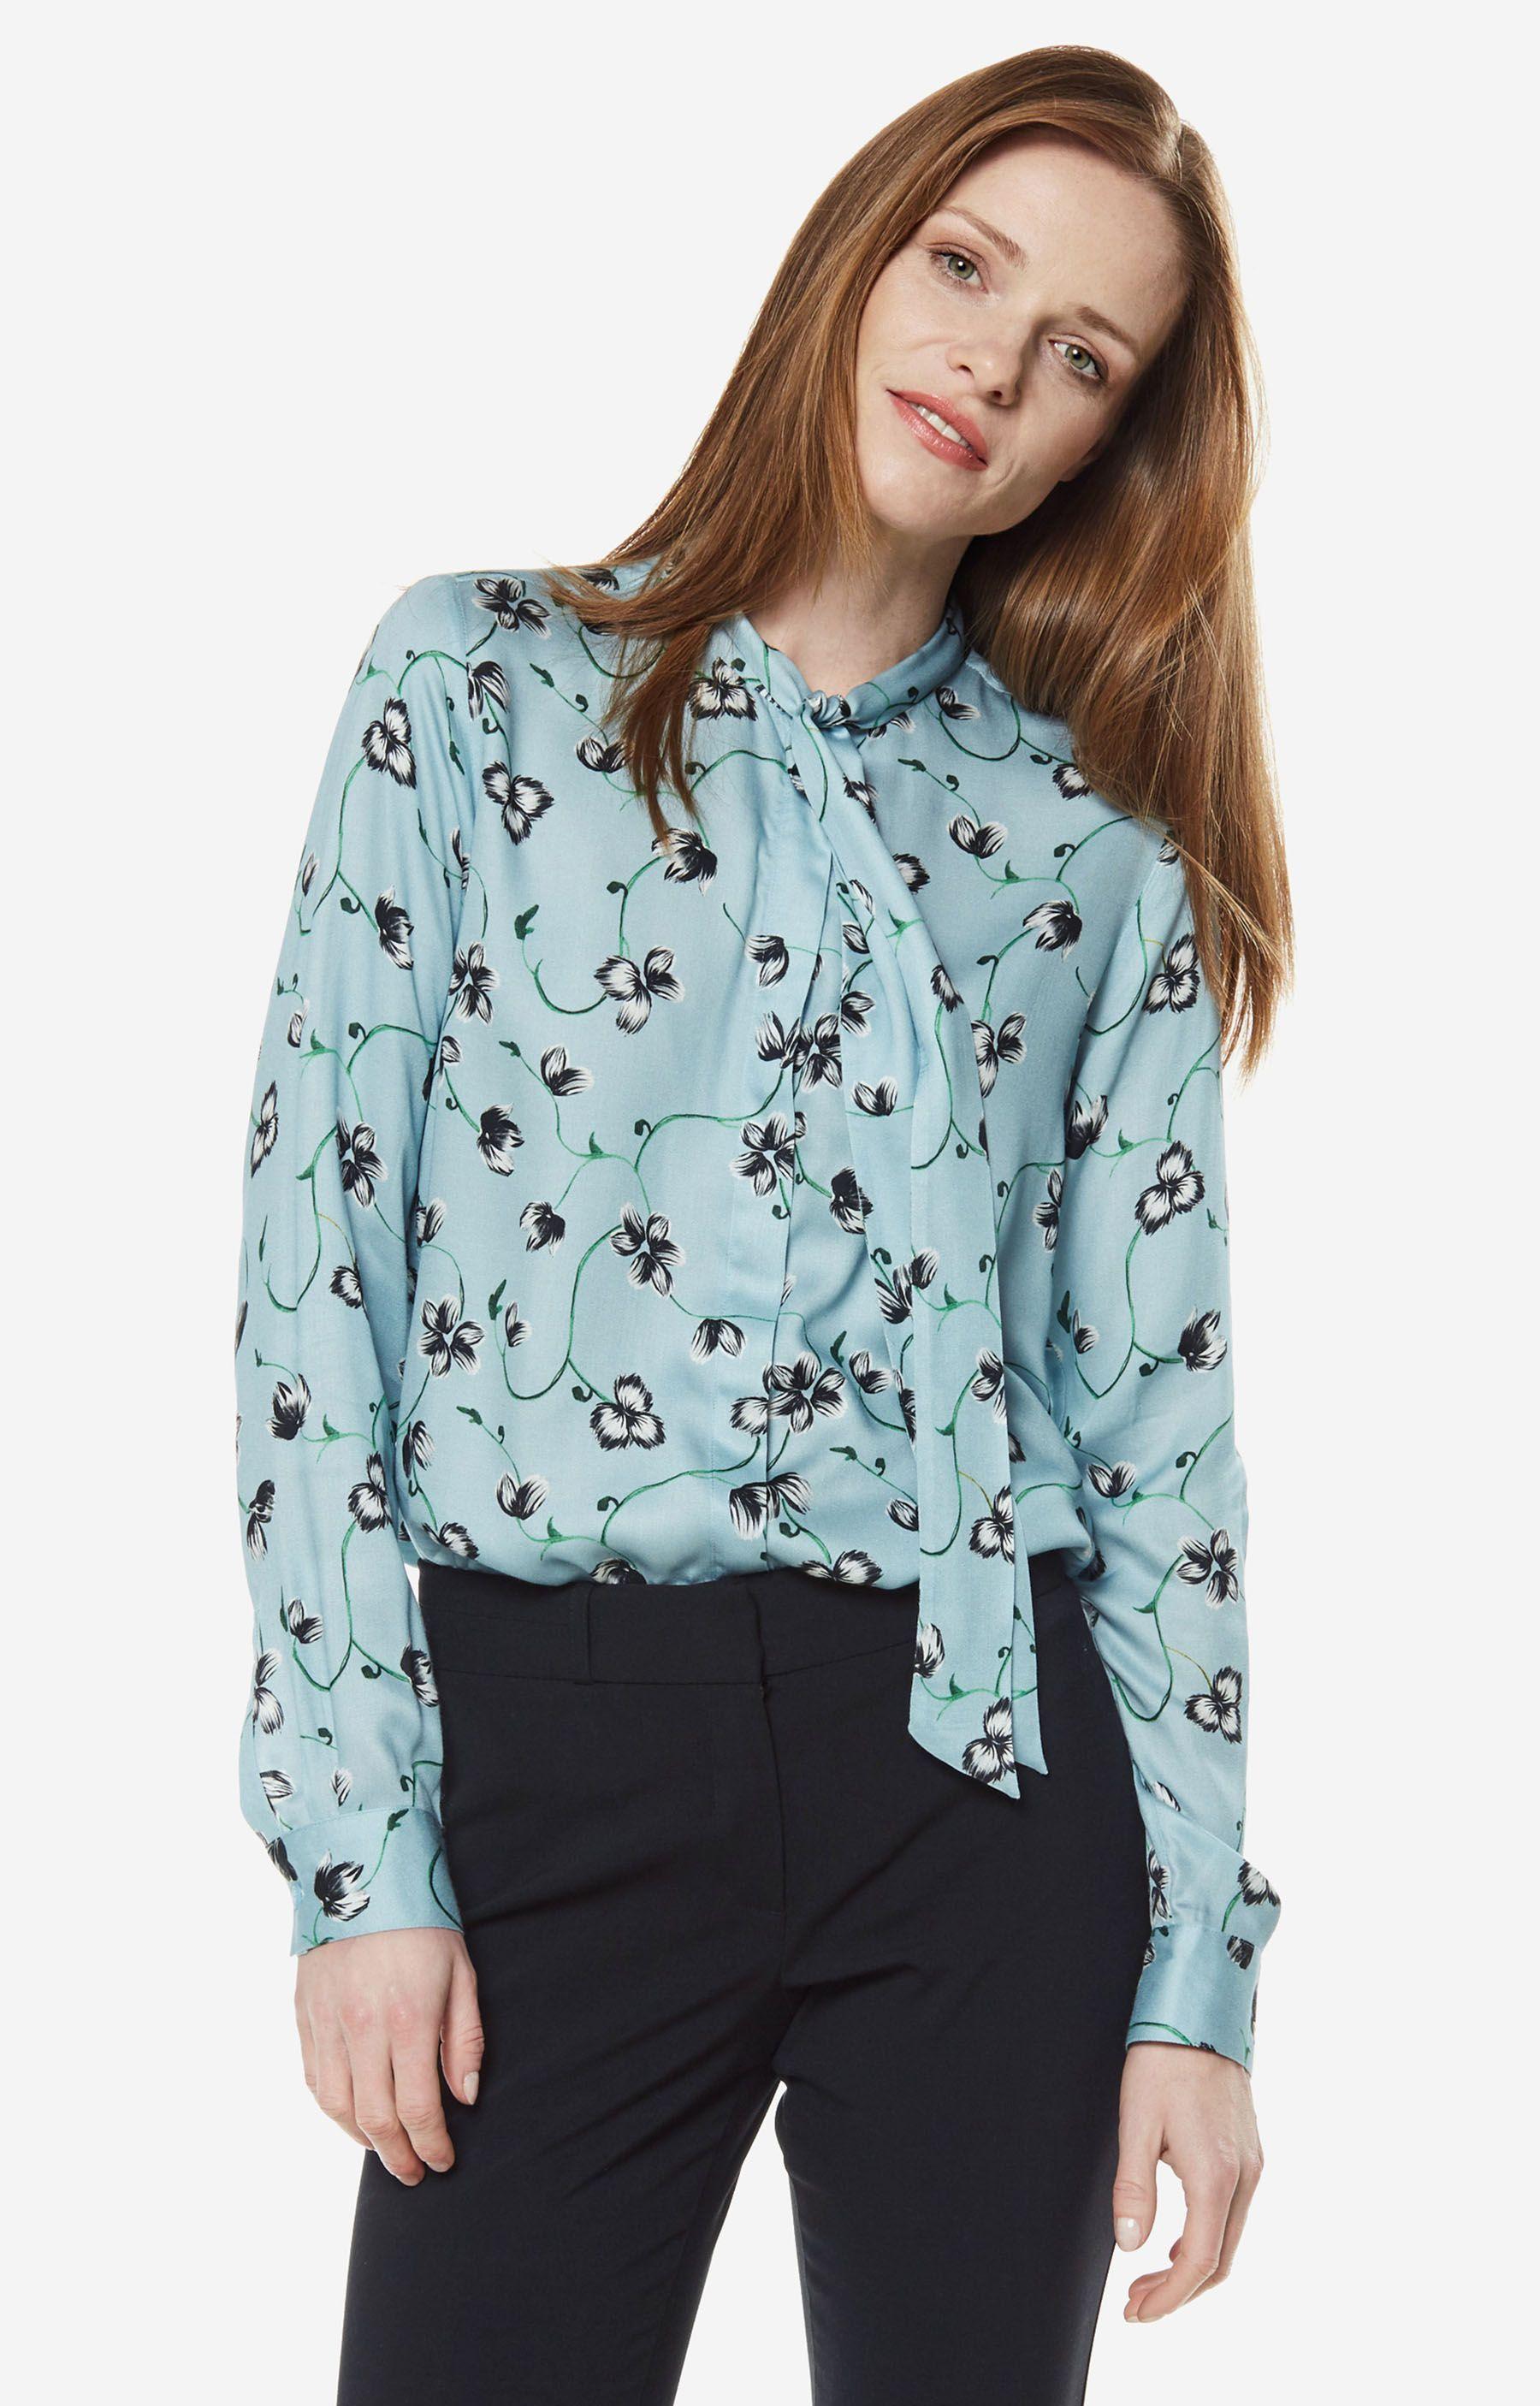 bae8bb103cee77 Koszule damskie - Niebieska koszula damska LAMBERT - DL13LB8746 - sklep  Wólczanka.pl